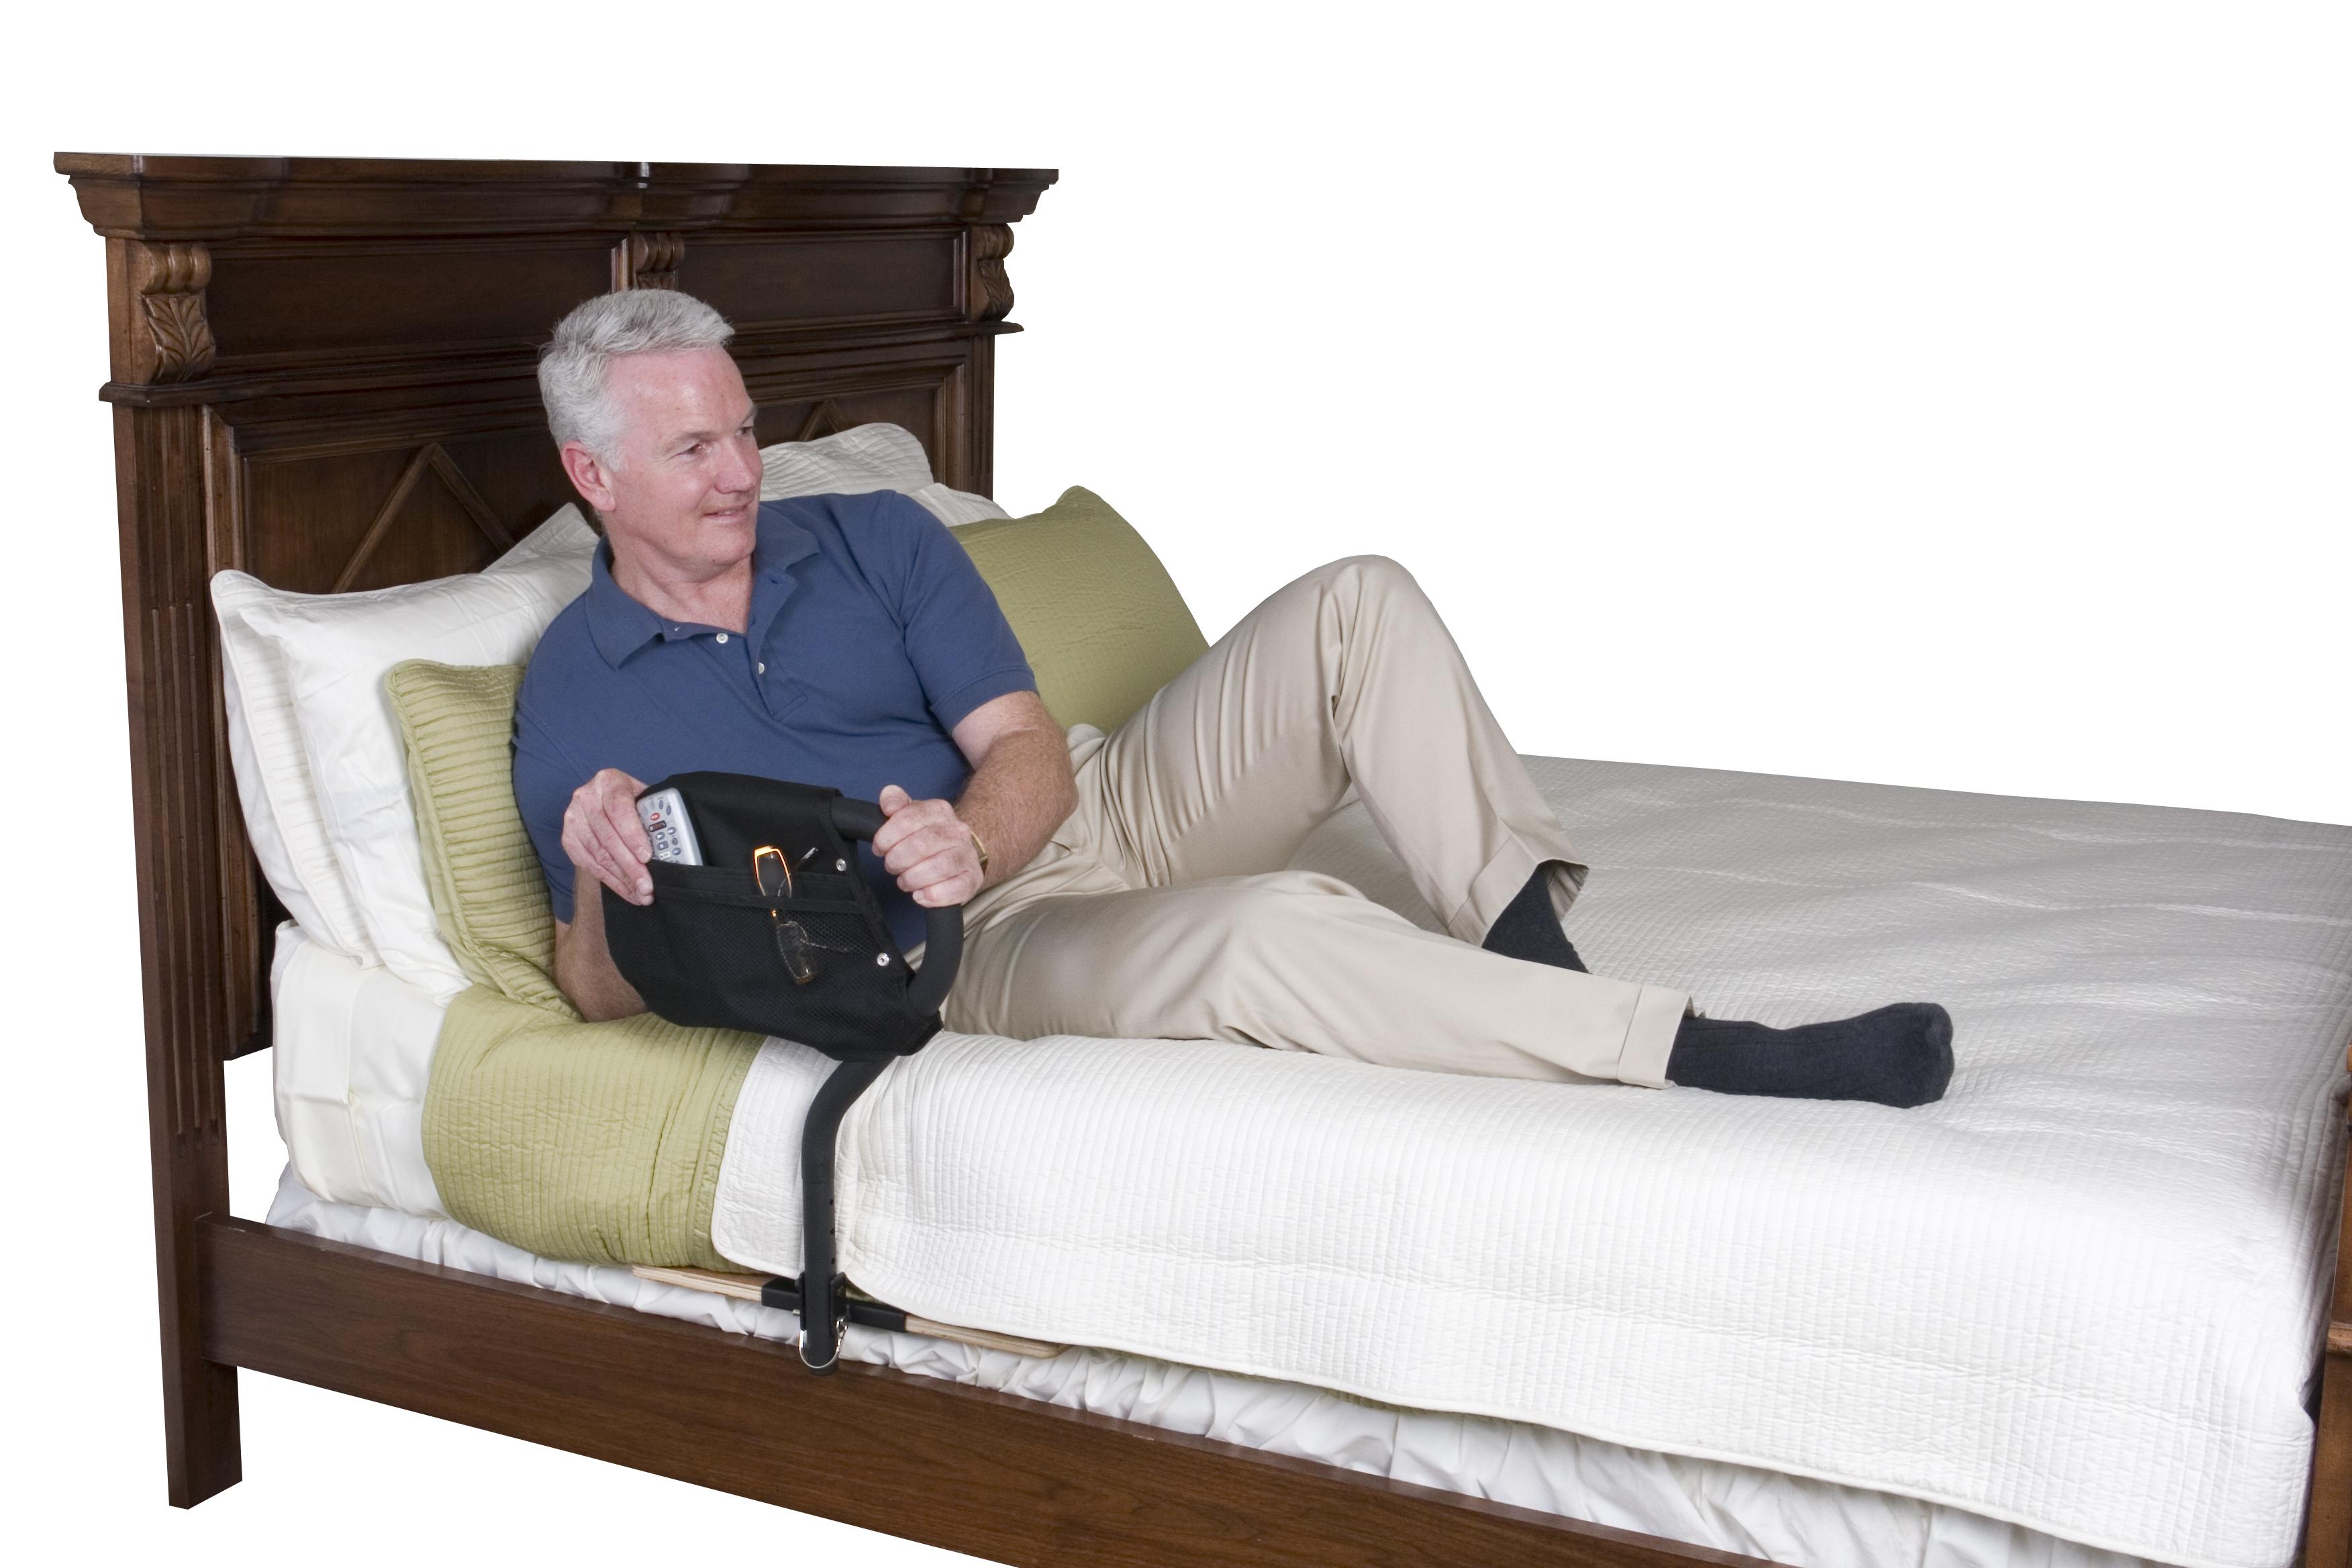 india cvs elderly for rails seniors australia adults bedding archaicfair canada bed walgreens